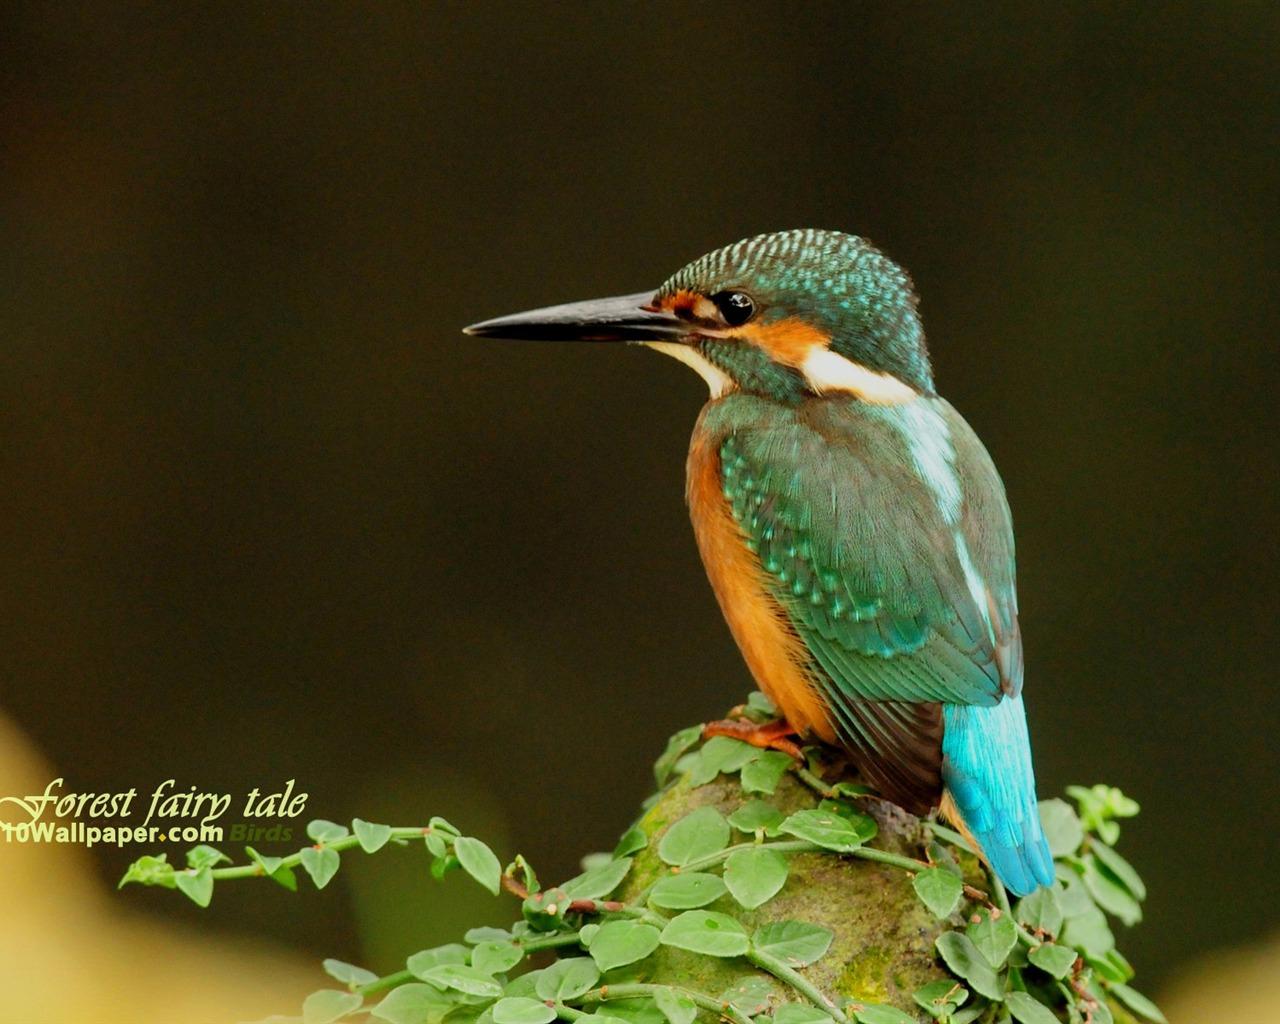 Kingfisher Calendar Wallpaper Download : Look sad kingfisher woods wallpaper